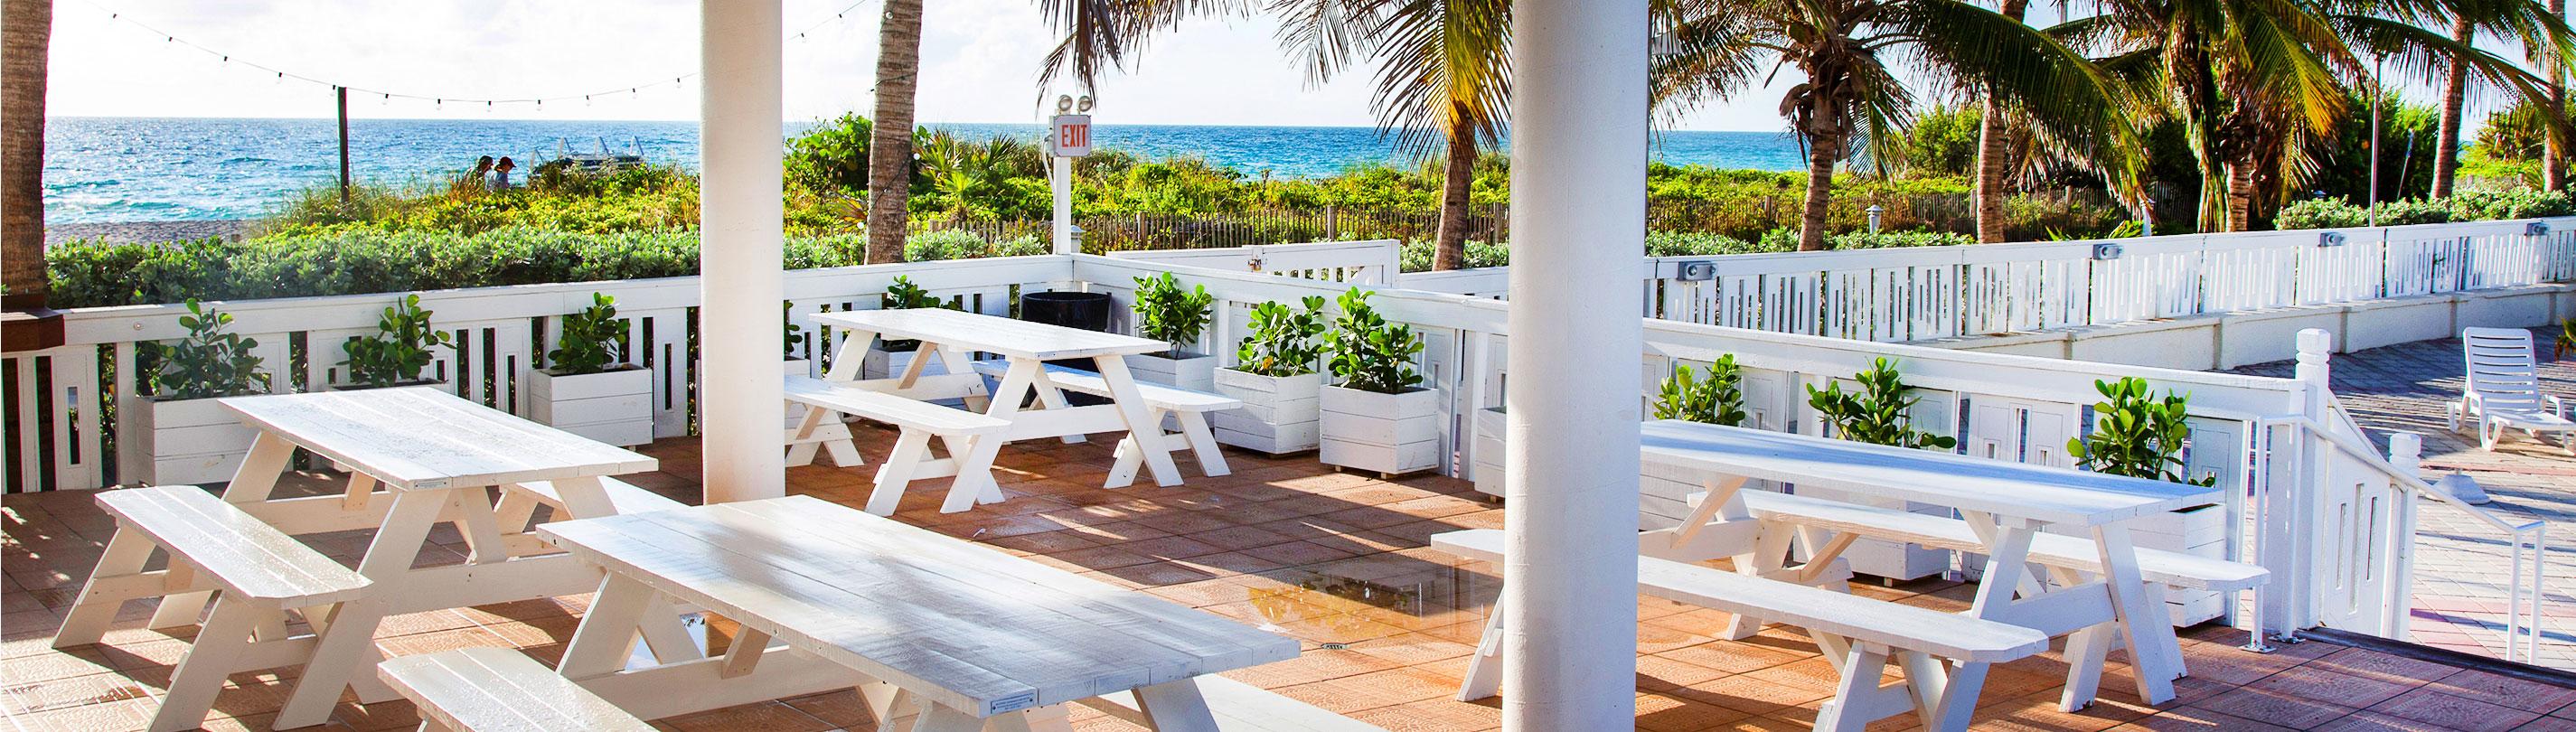 Tiki Bar deauville beach resort